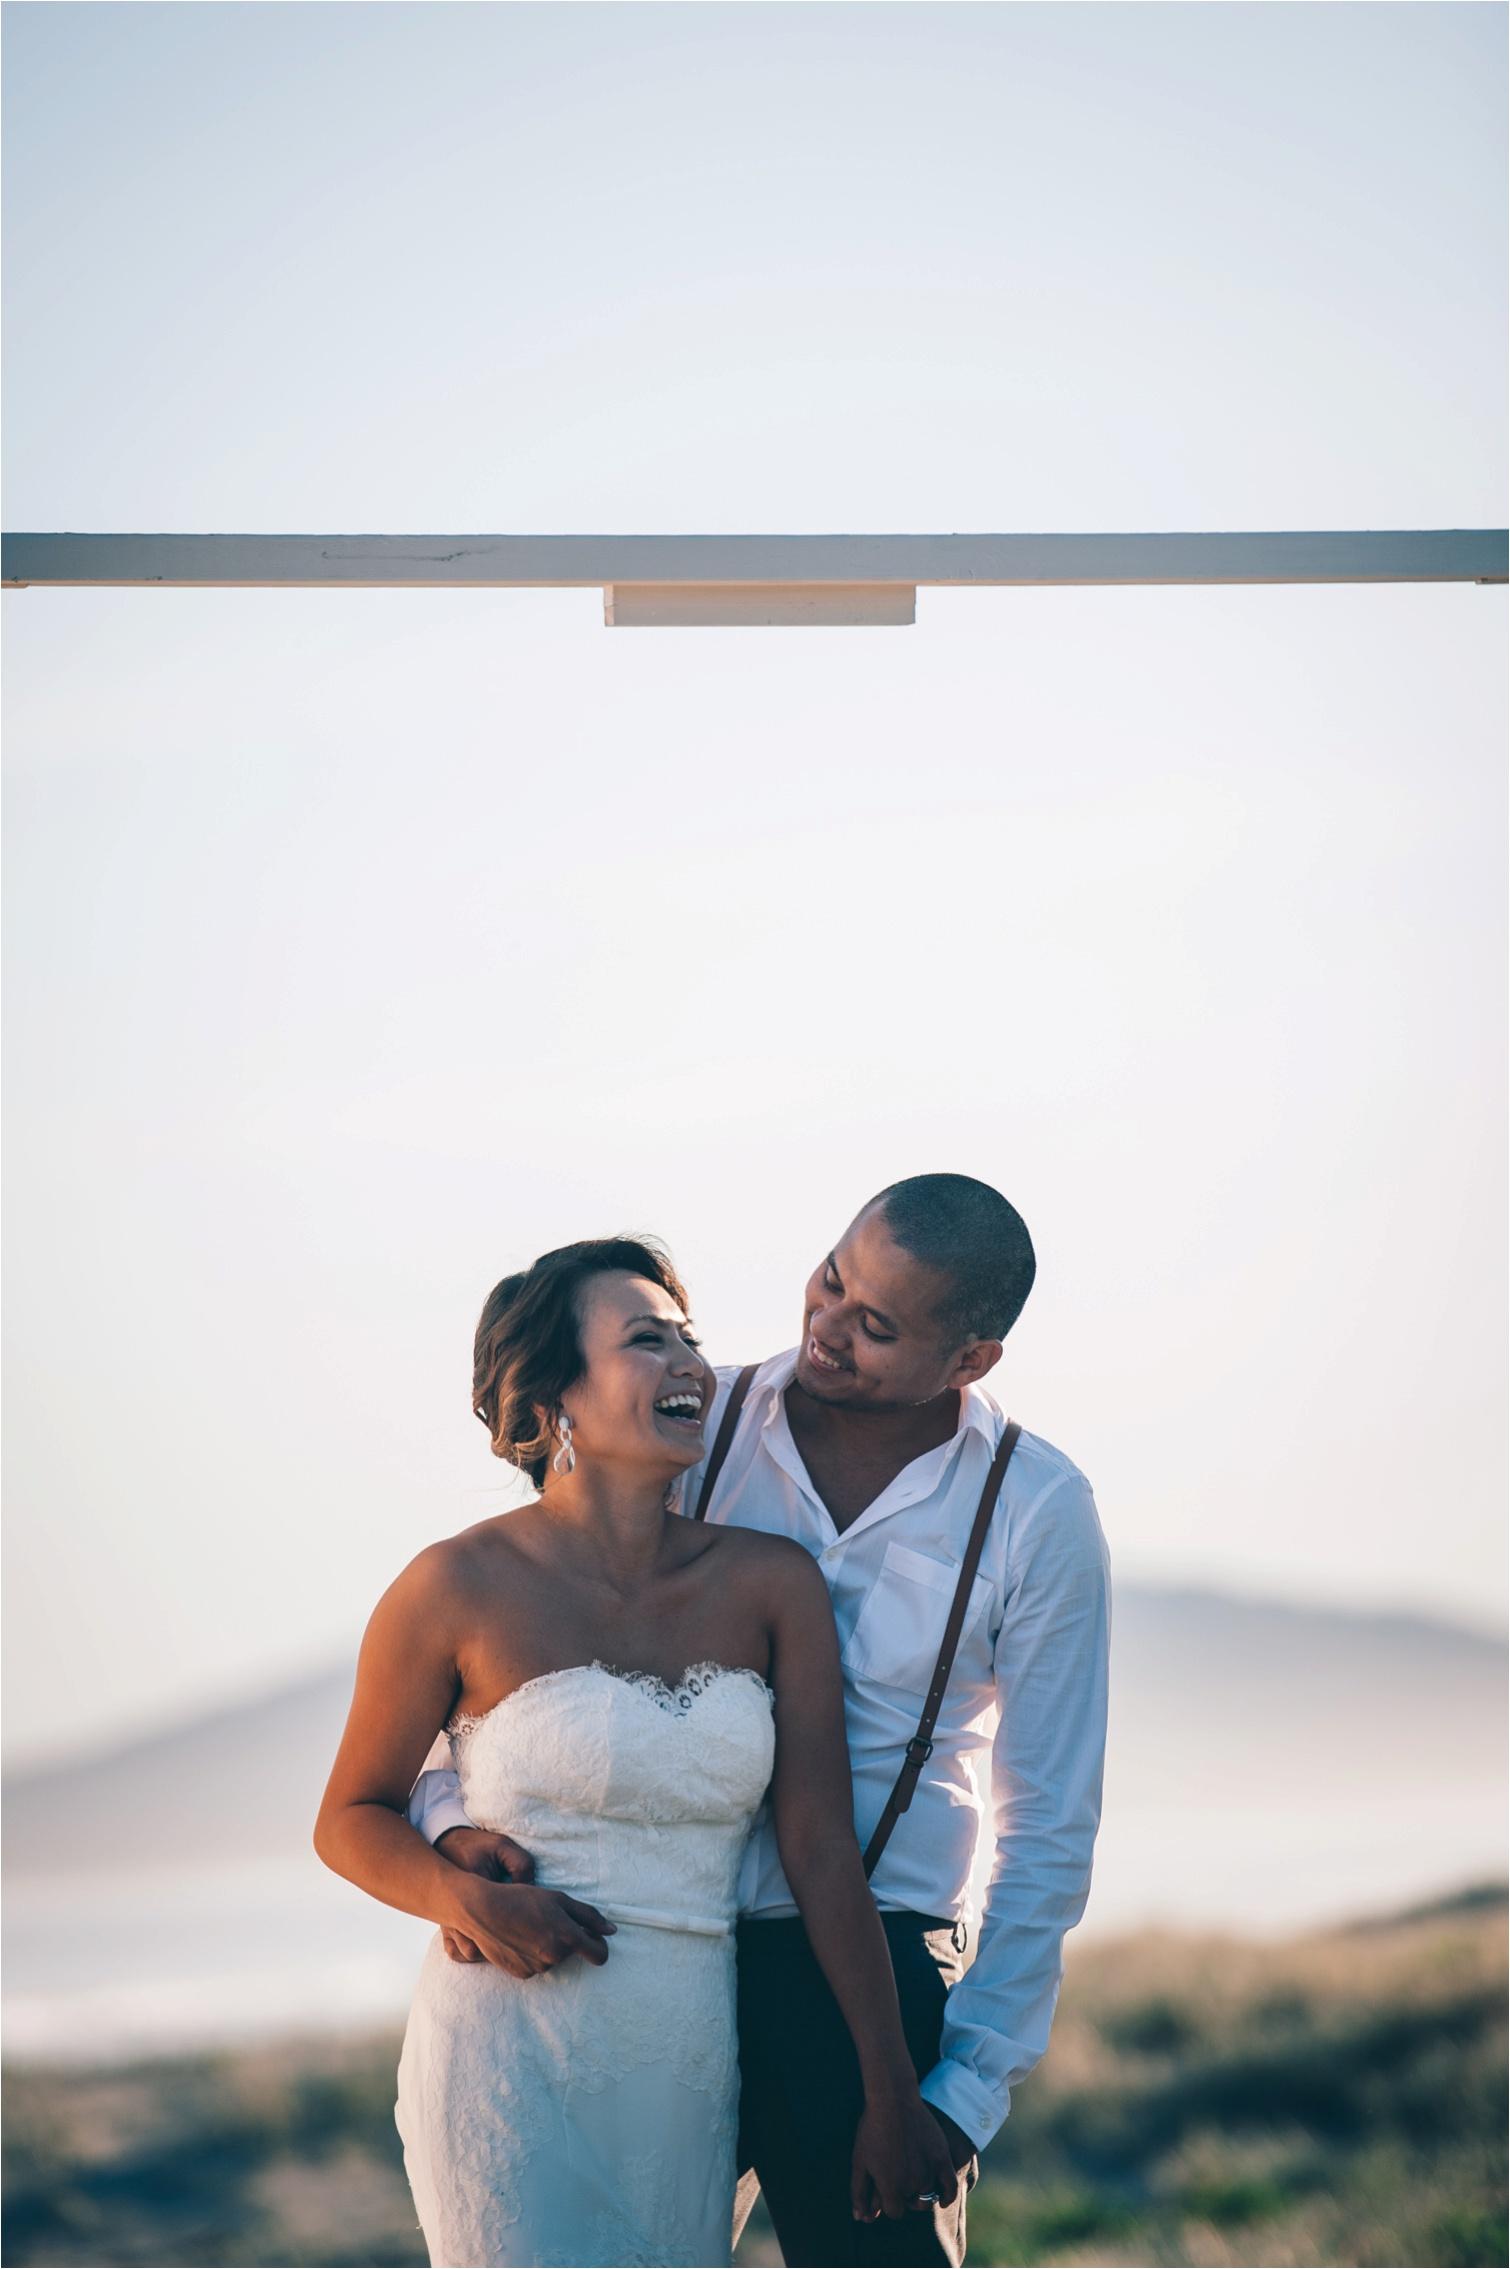 Gerrigong_Beach_Winery_Wedding-by_The_Follans_0044.jpg